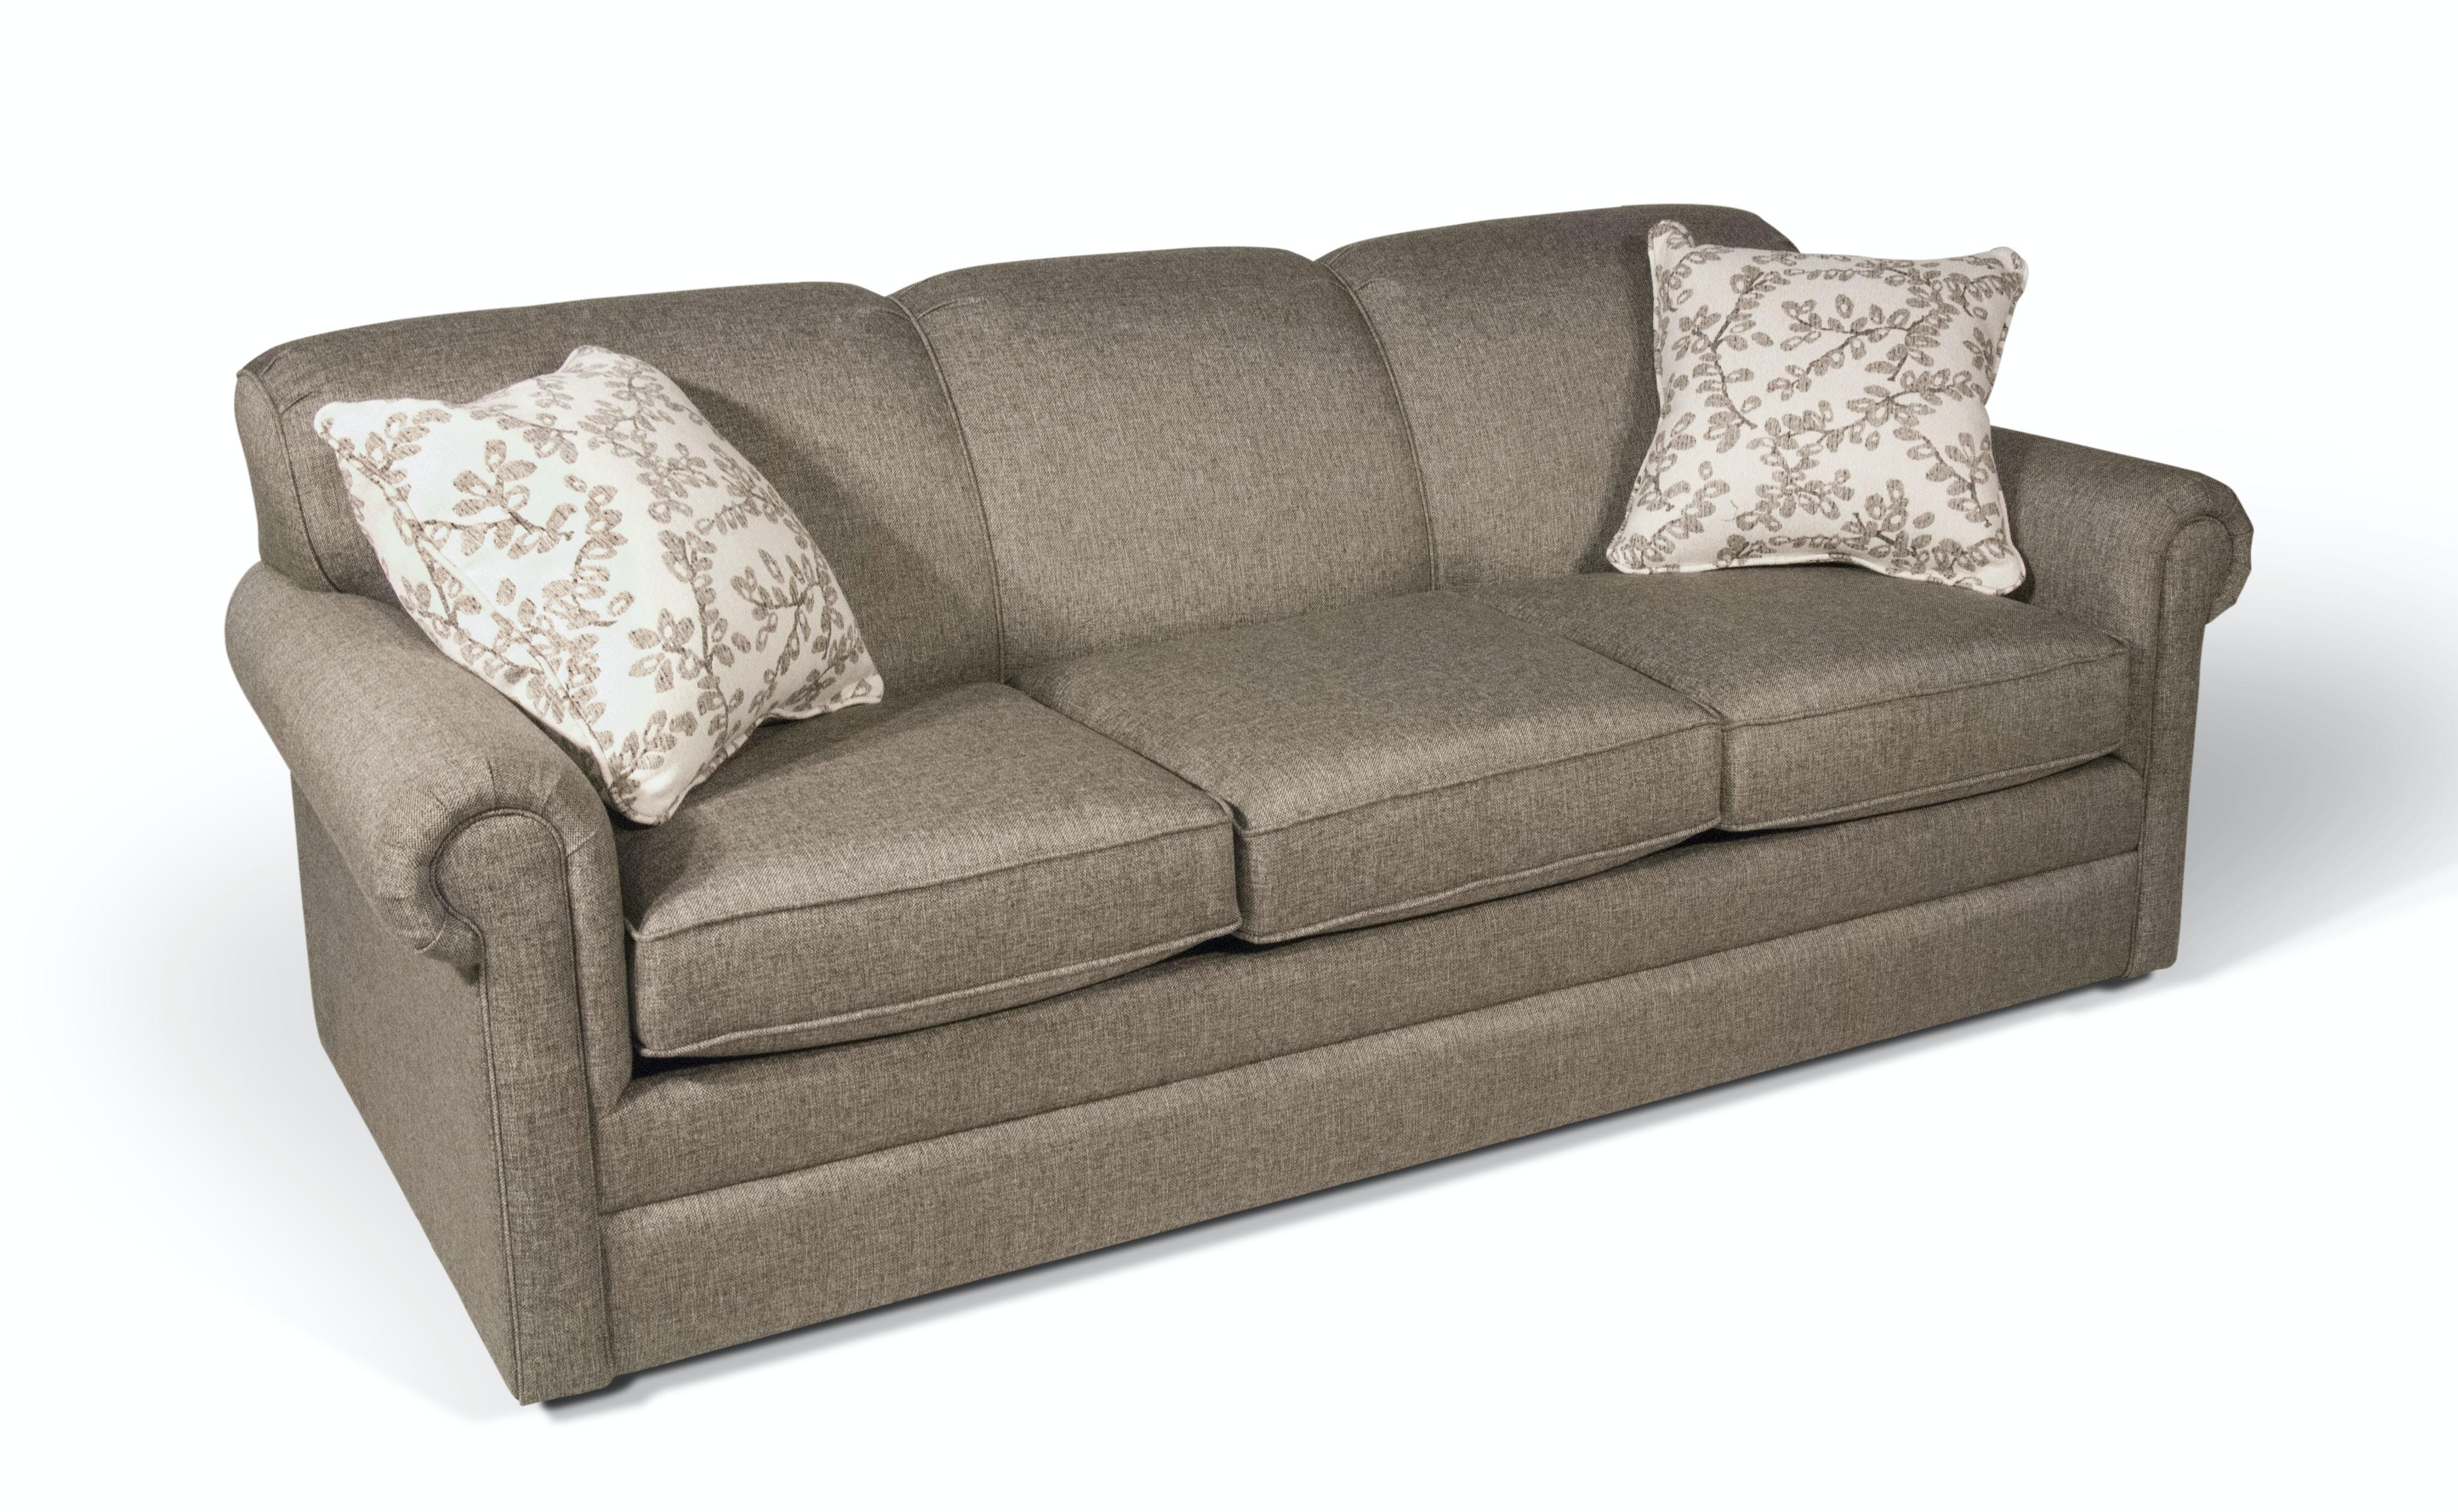 England Greece Queen Sleeper Sofa UPH SLPR GREECE